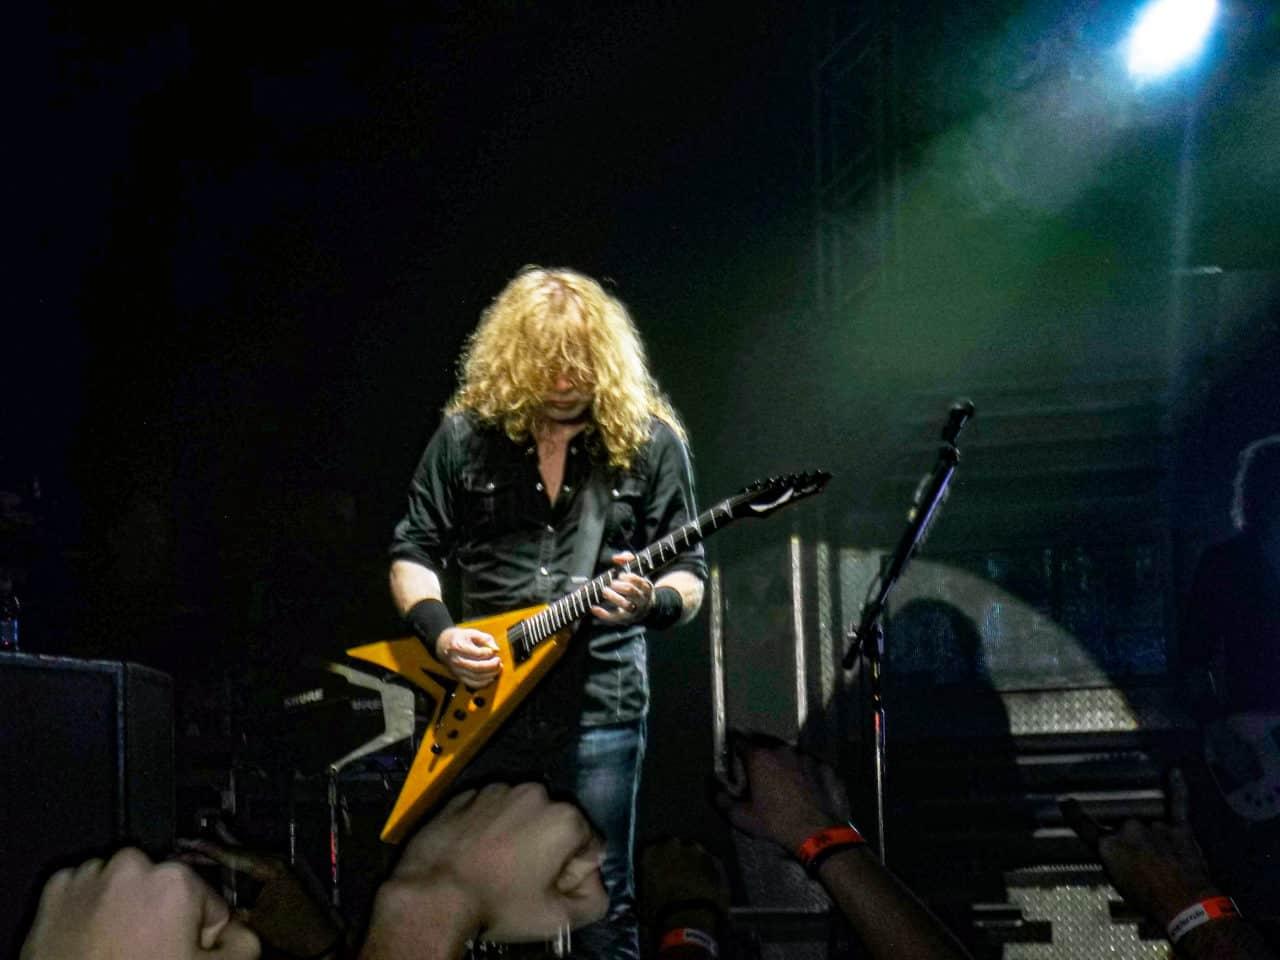 Dave Mustaine Show em Curitiba | Photo Credit: Jhonesilverio